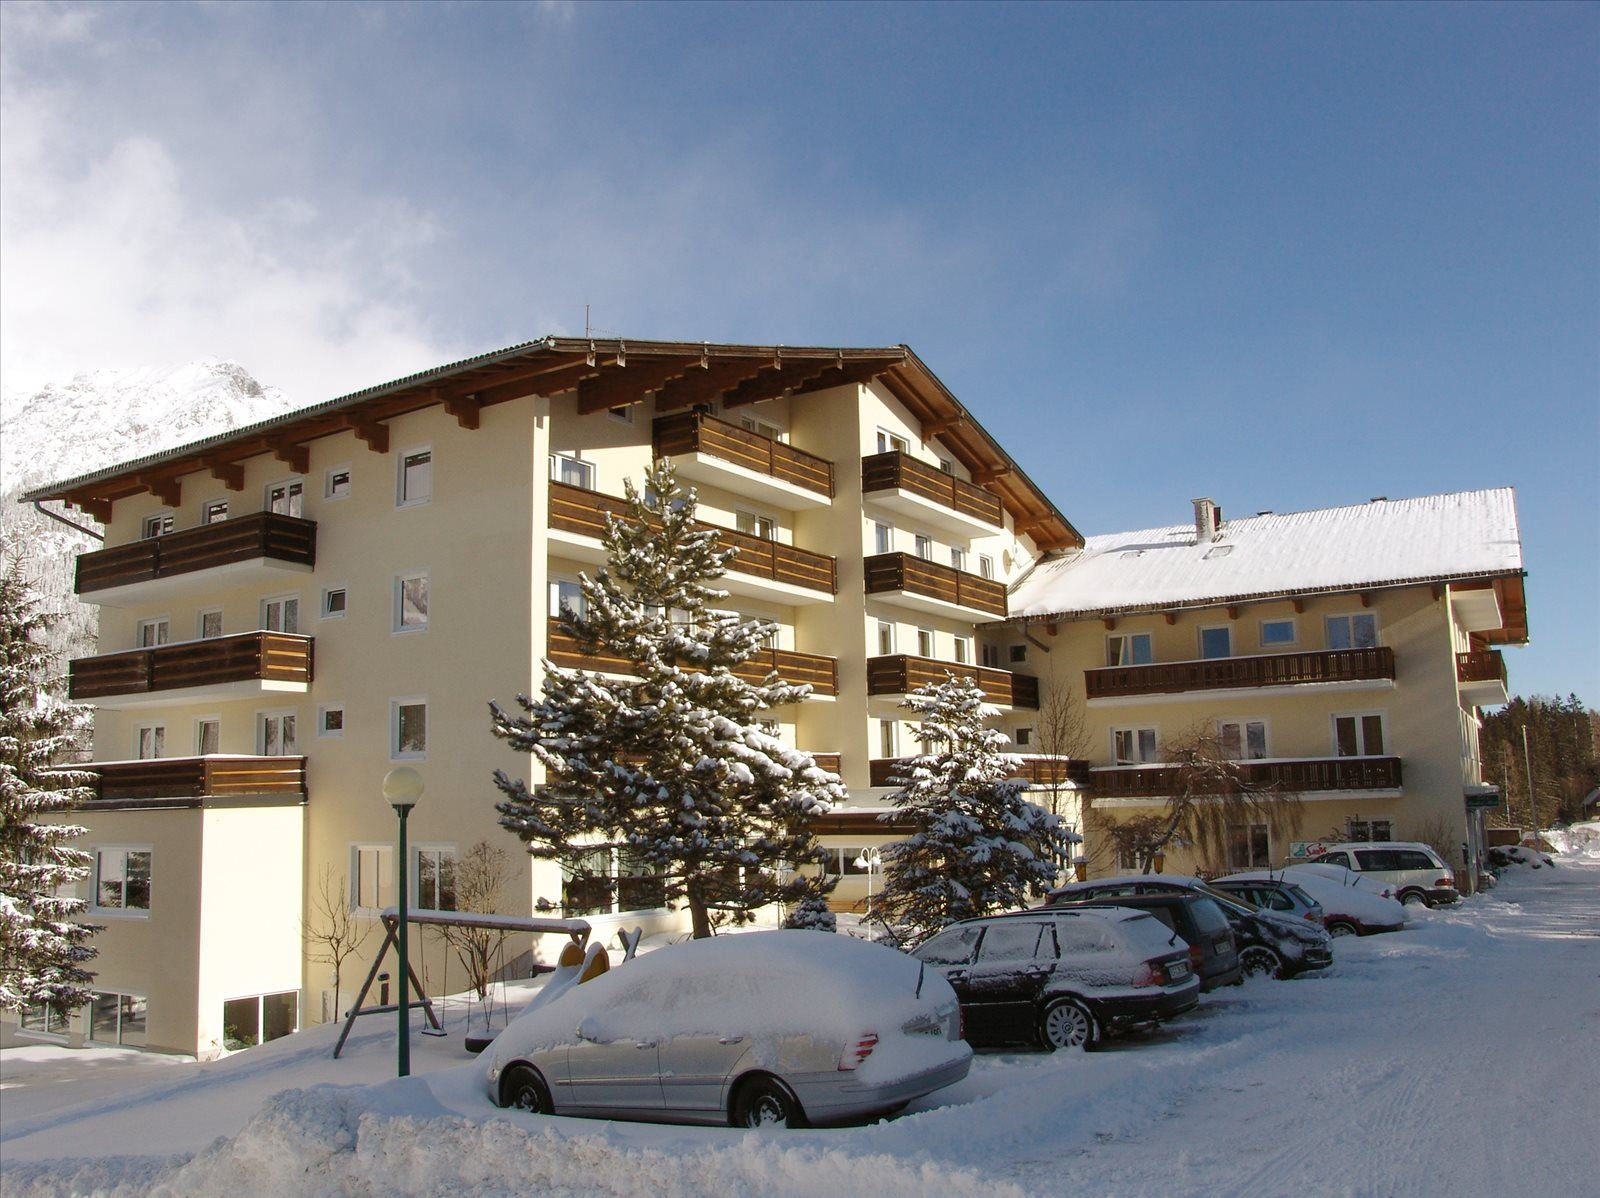 Hotel Post - Ramsau am Dachstein